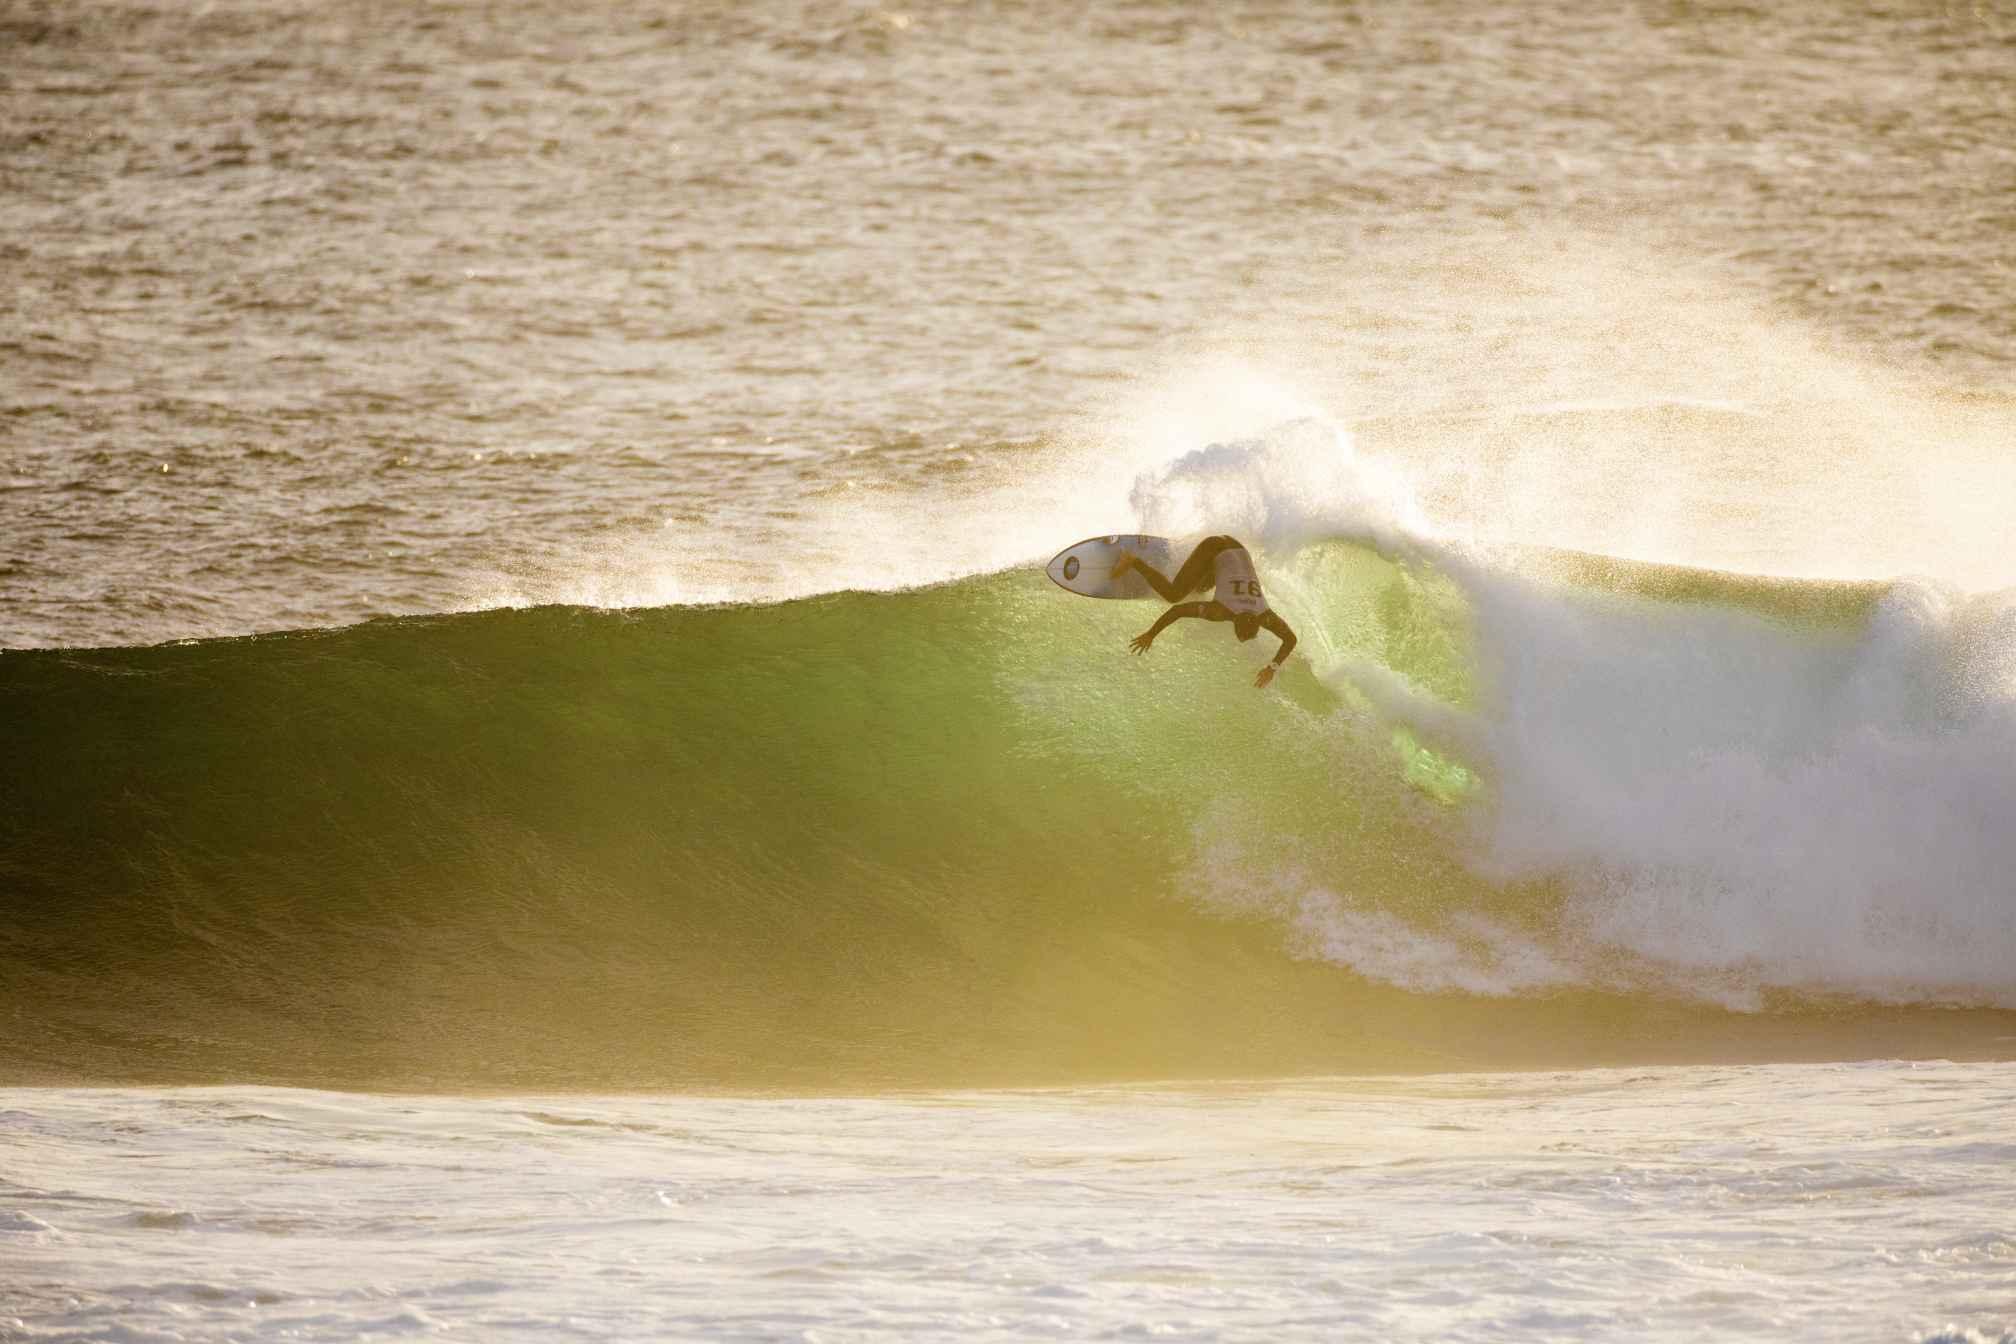 Top 5 Waves Margaret River - Round 32